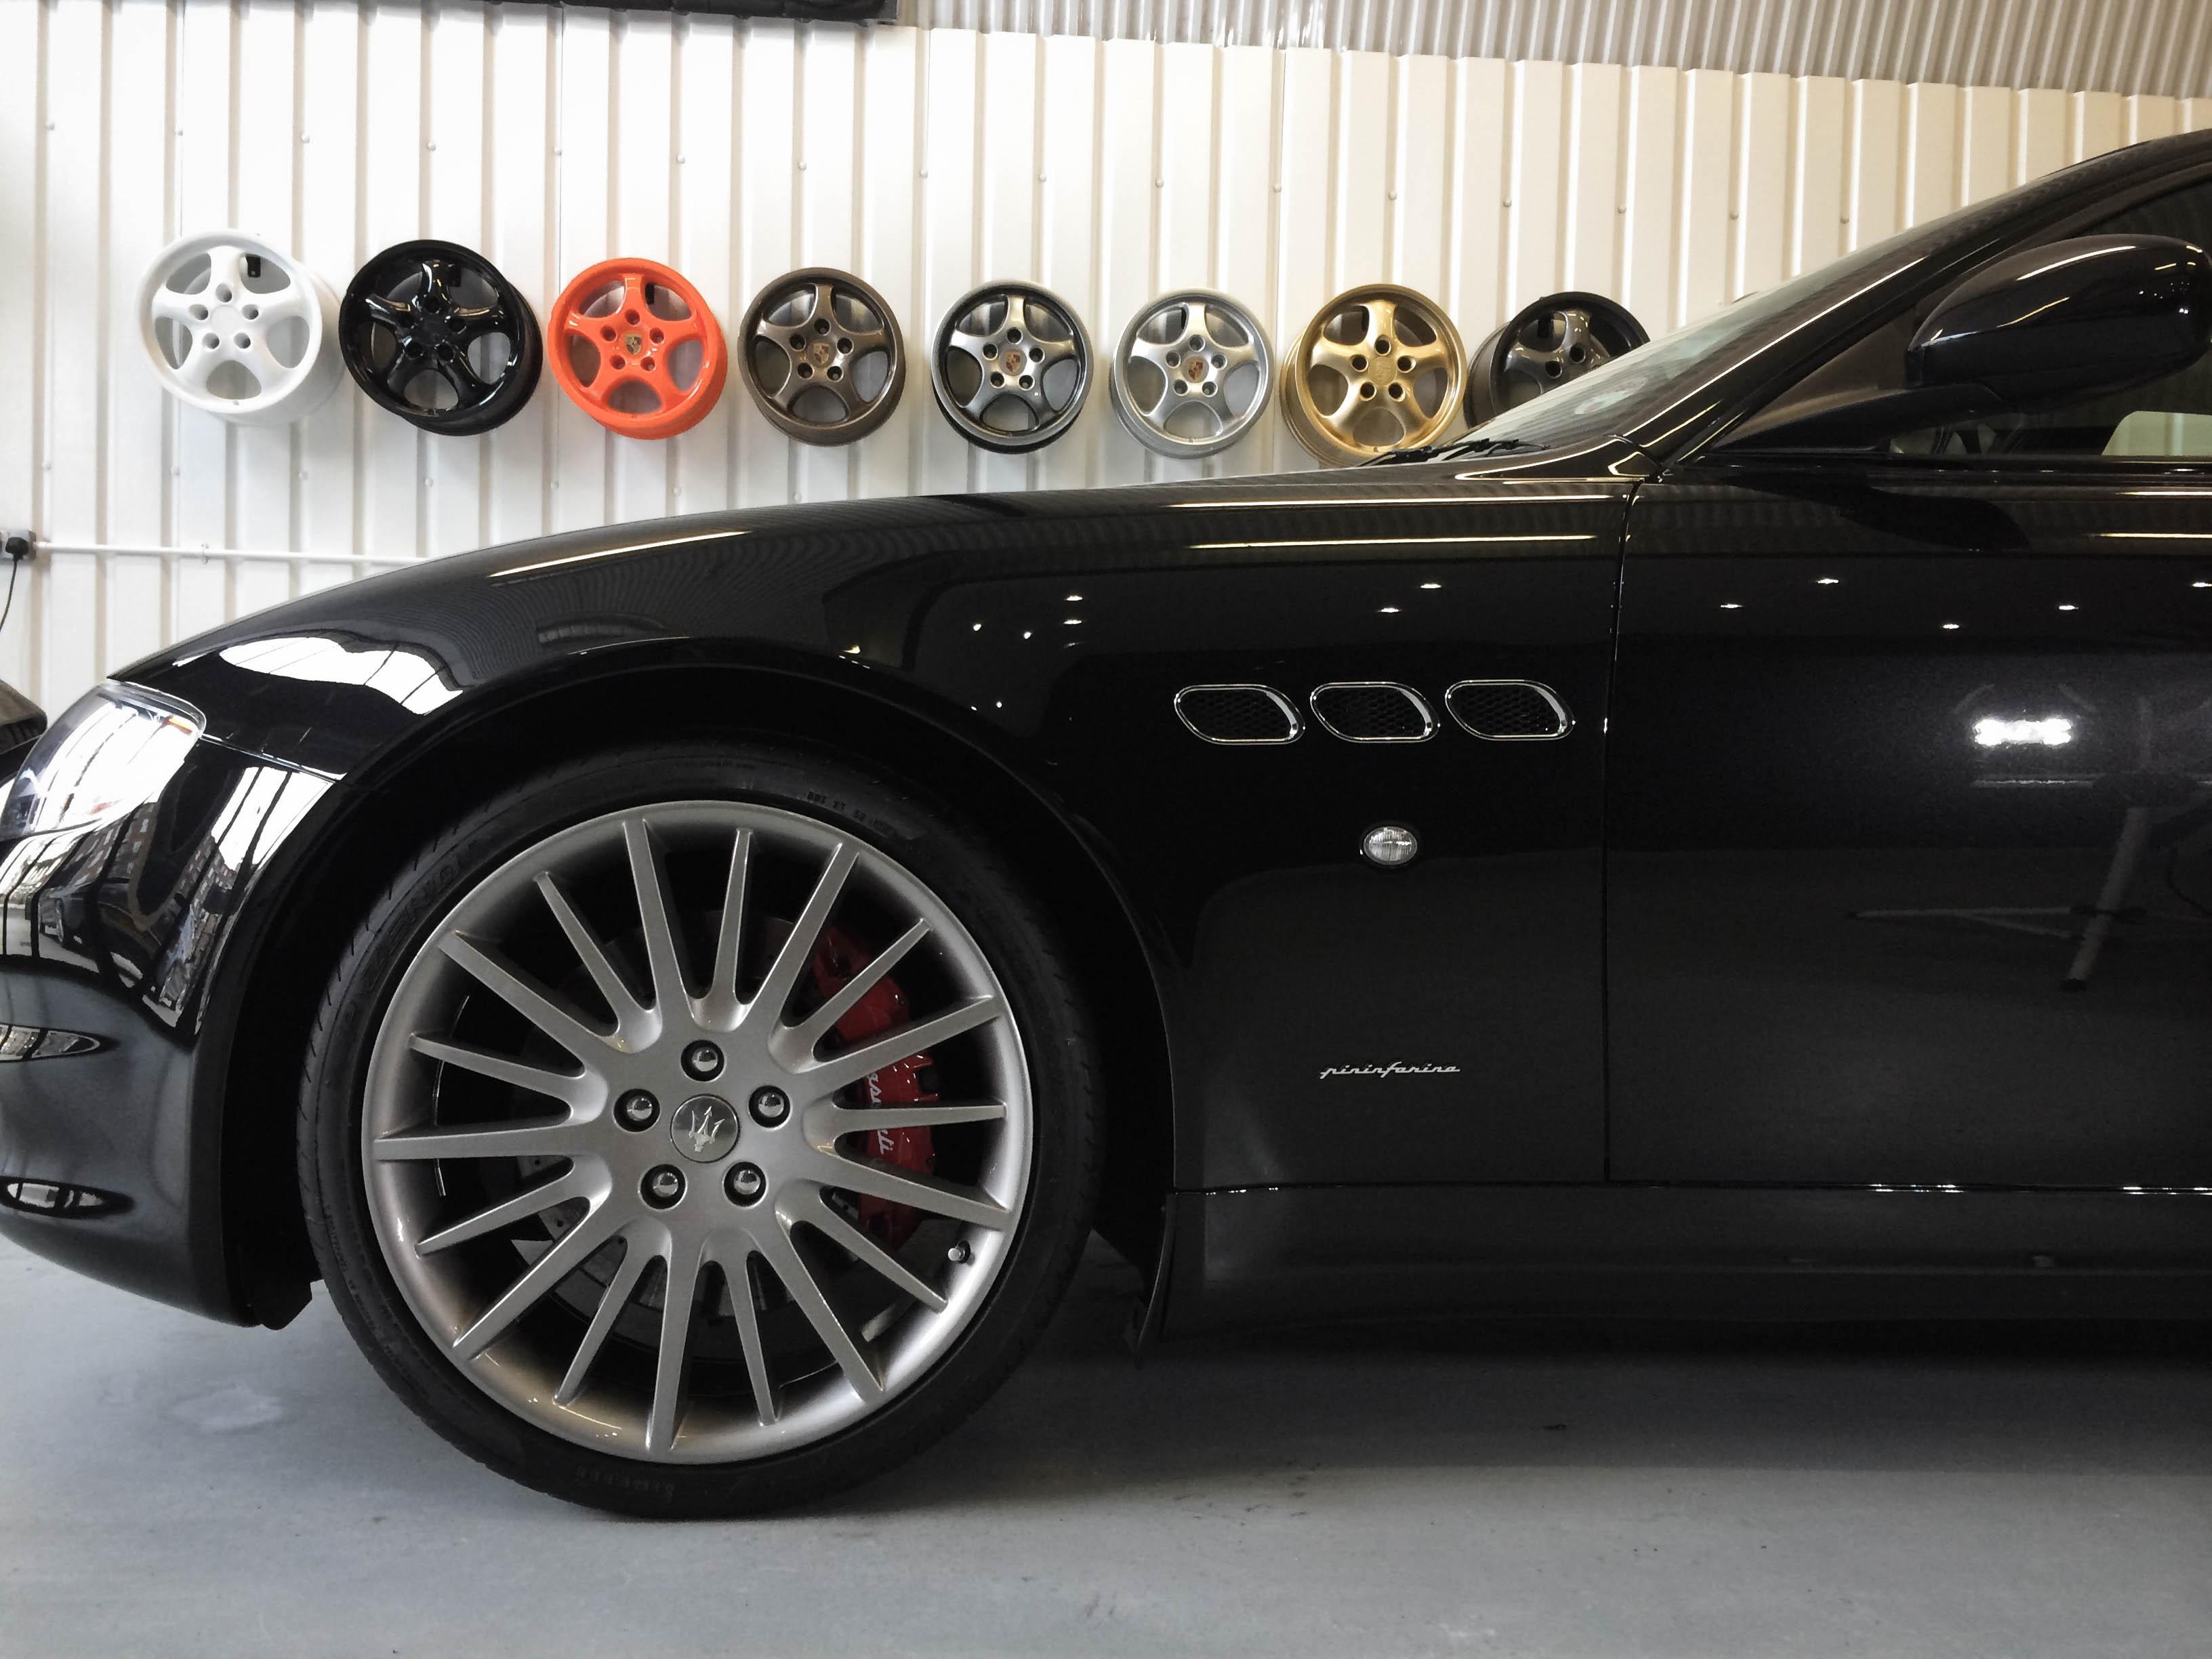 Maserati Quatroporte – Front wheel